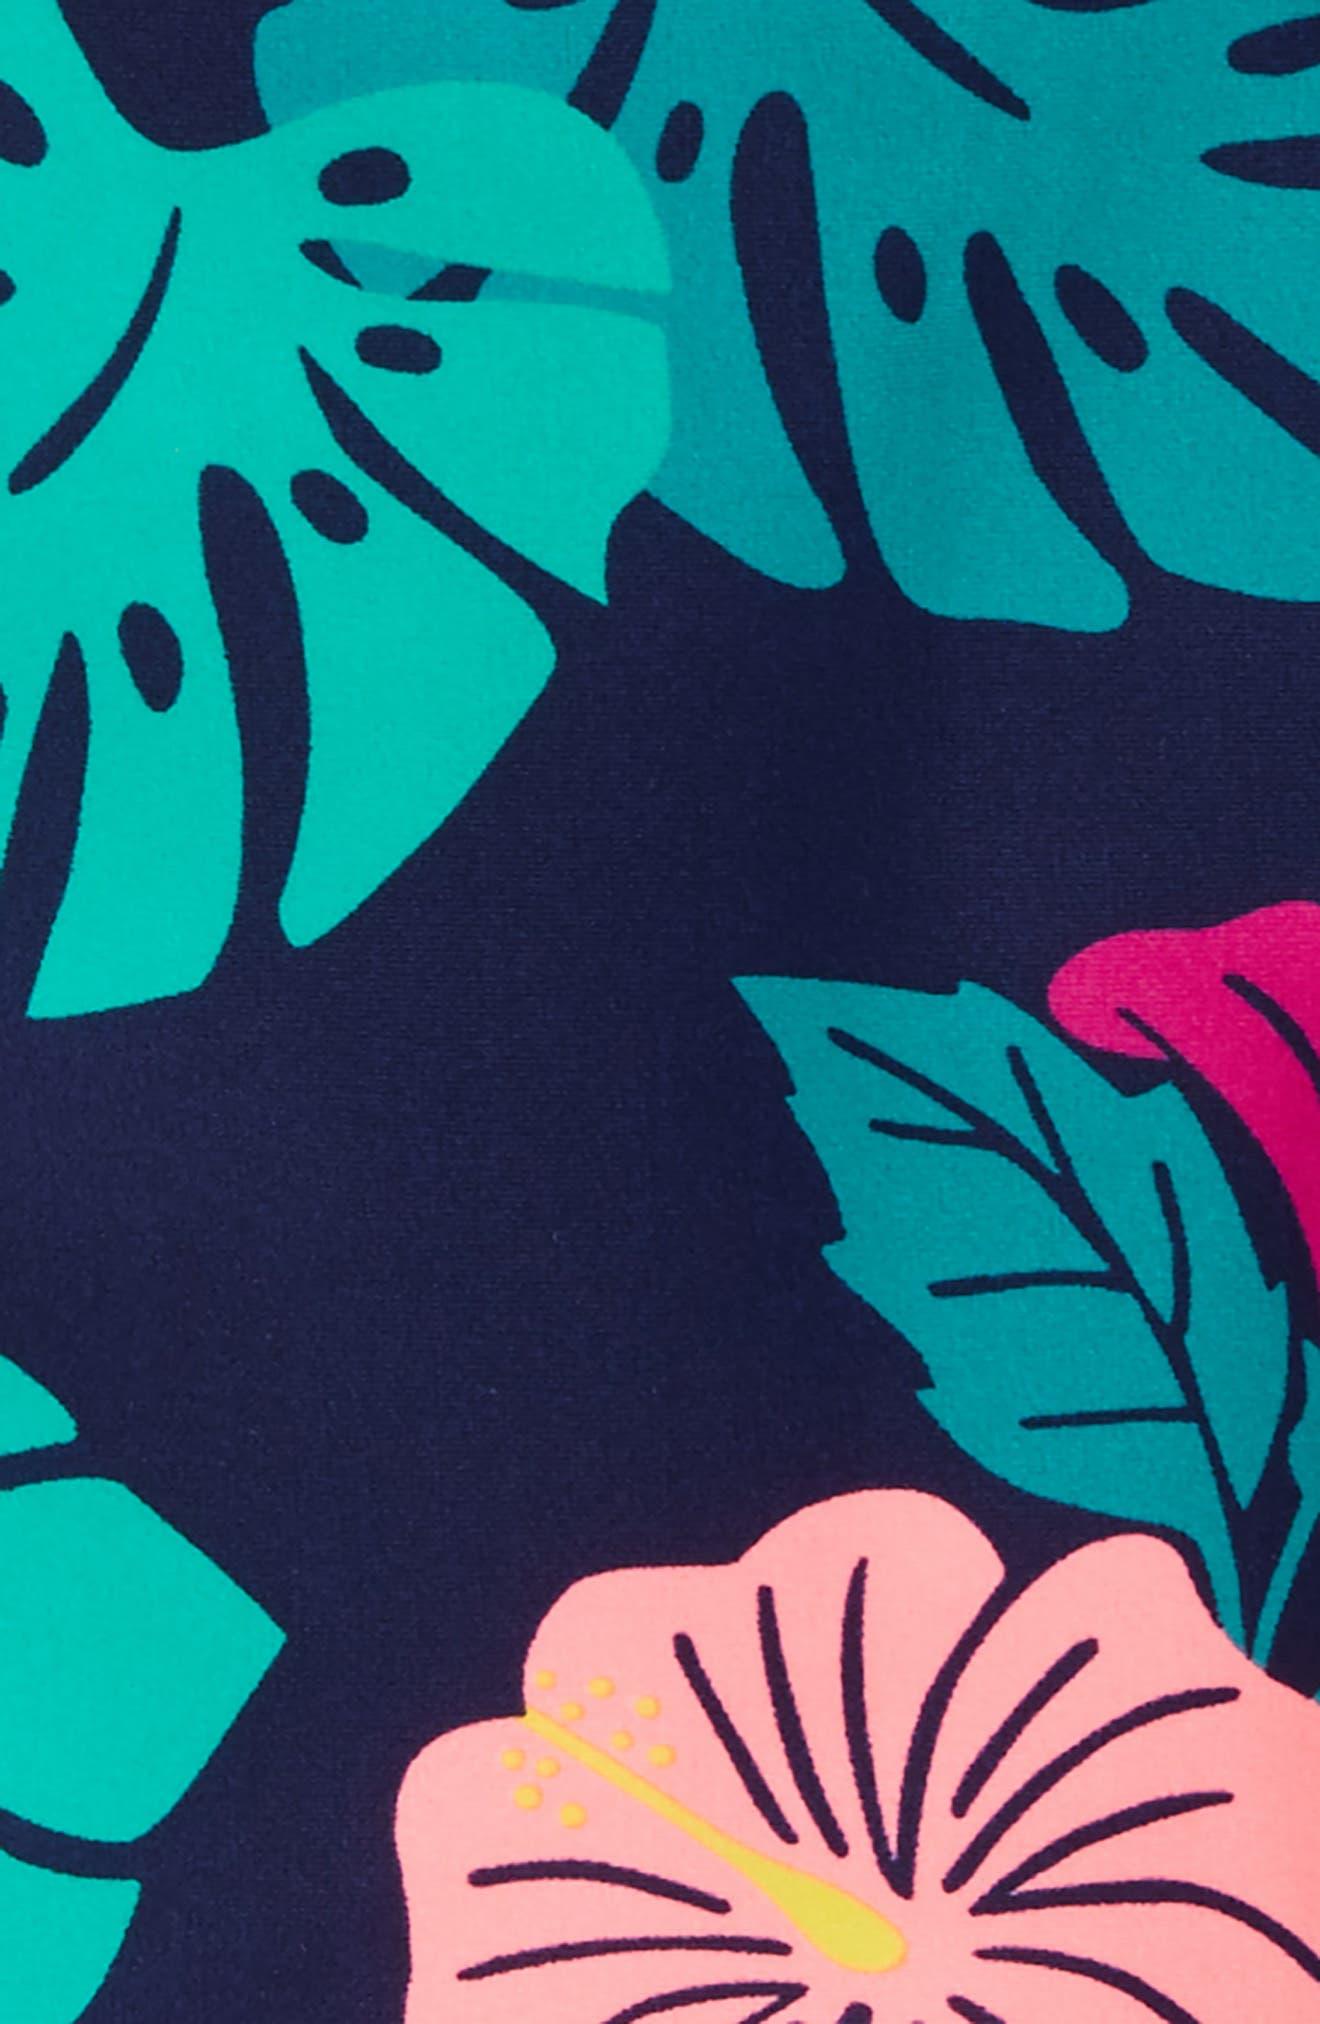 Mixed Print Two-Piece Rashguard Swimsuit,                             Alternate thumbnail 2, color,